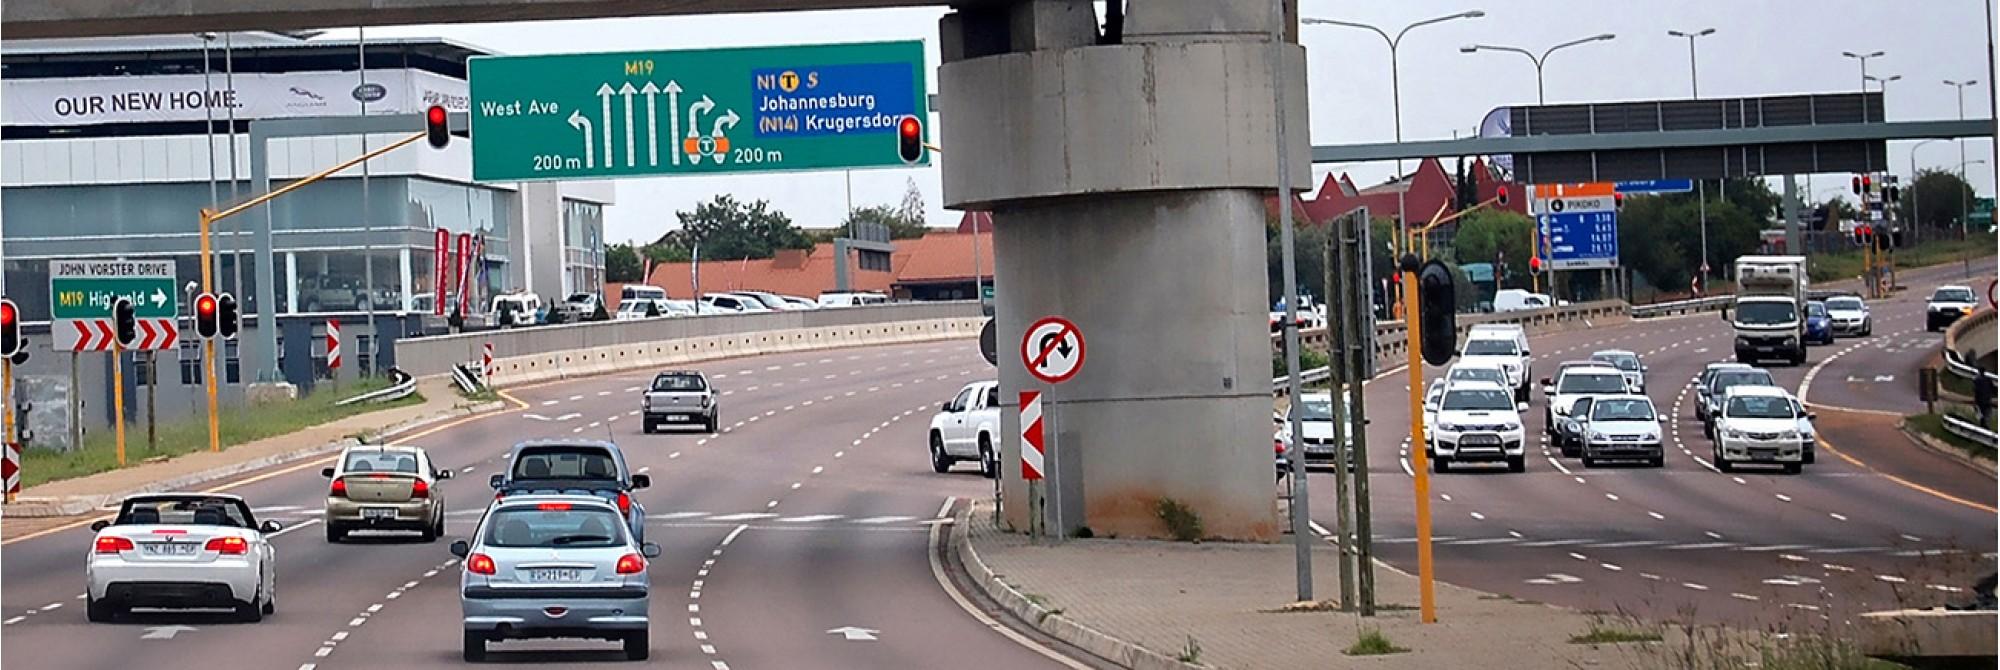 Keeping Johannesburg Safe